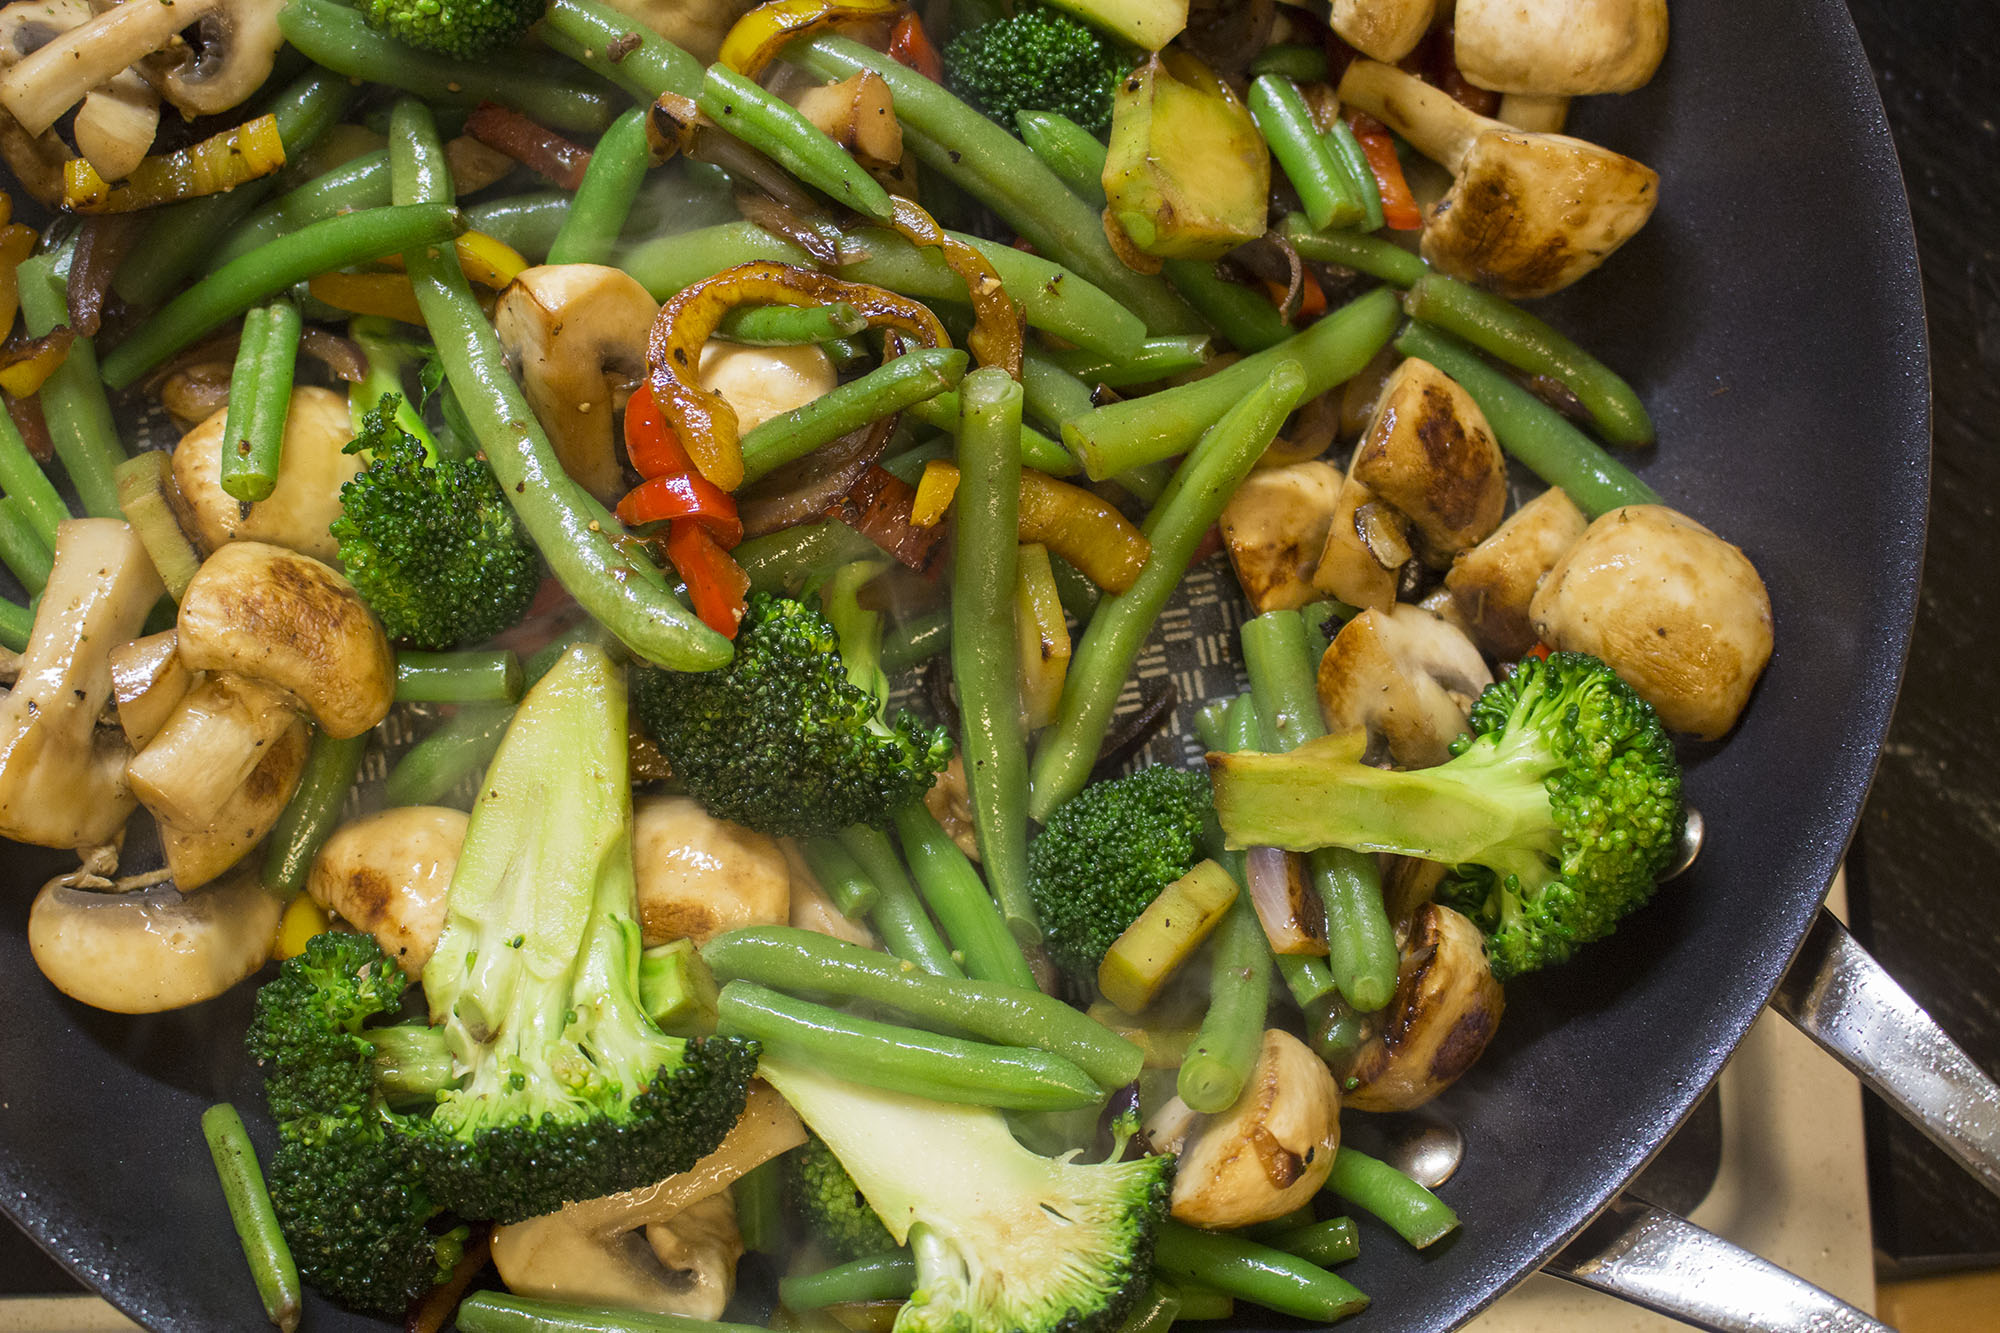 Smørstegte Grøntsager Fru Kofoeds Køkken